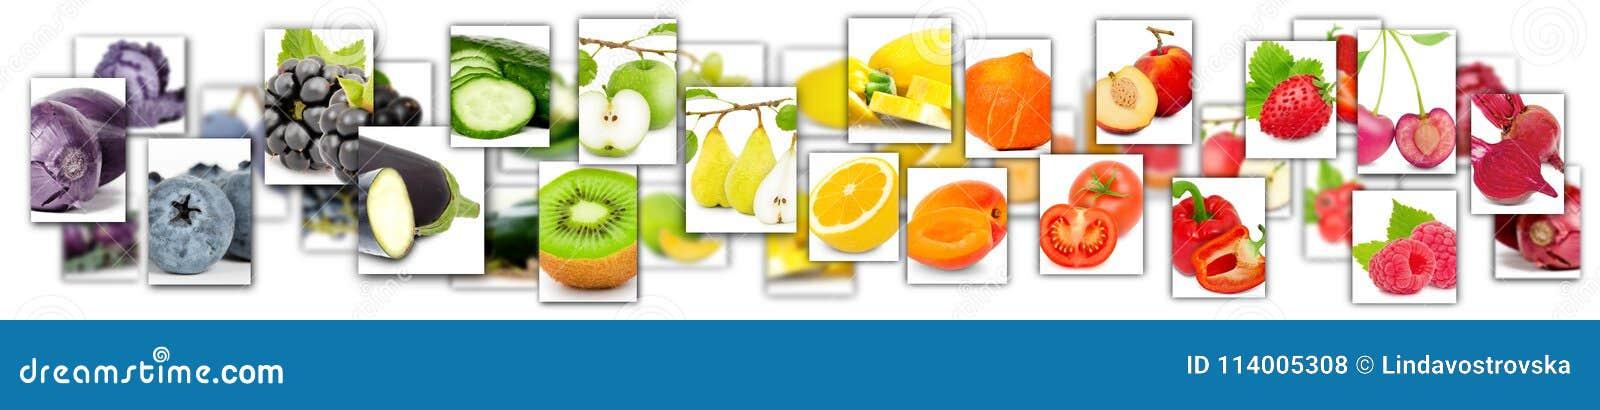 Fruit en plantaardige mengeling